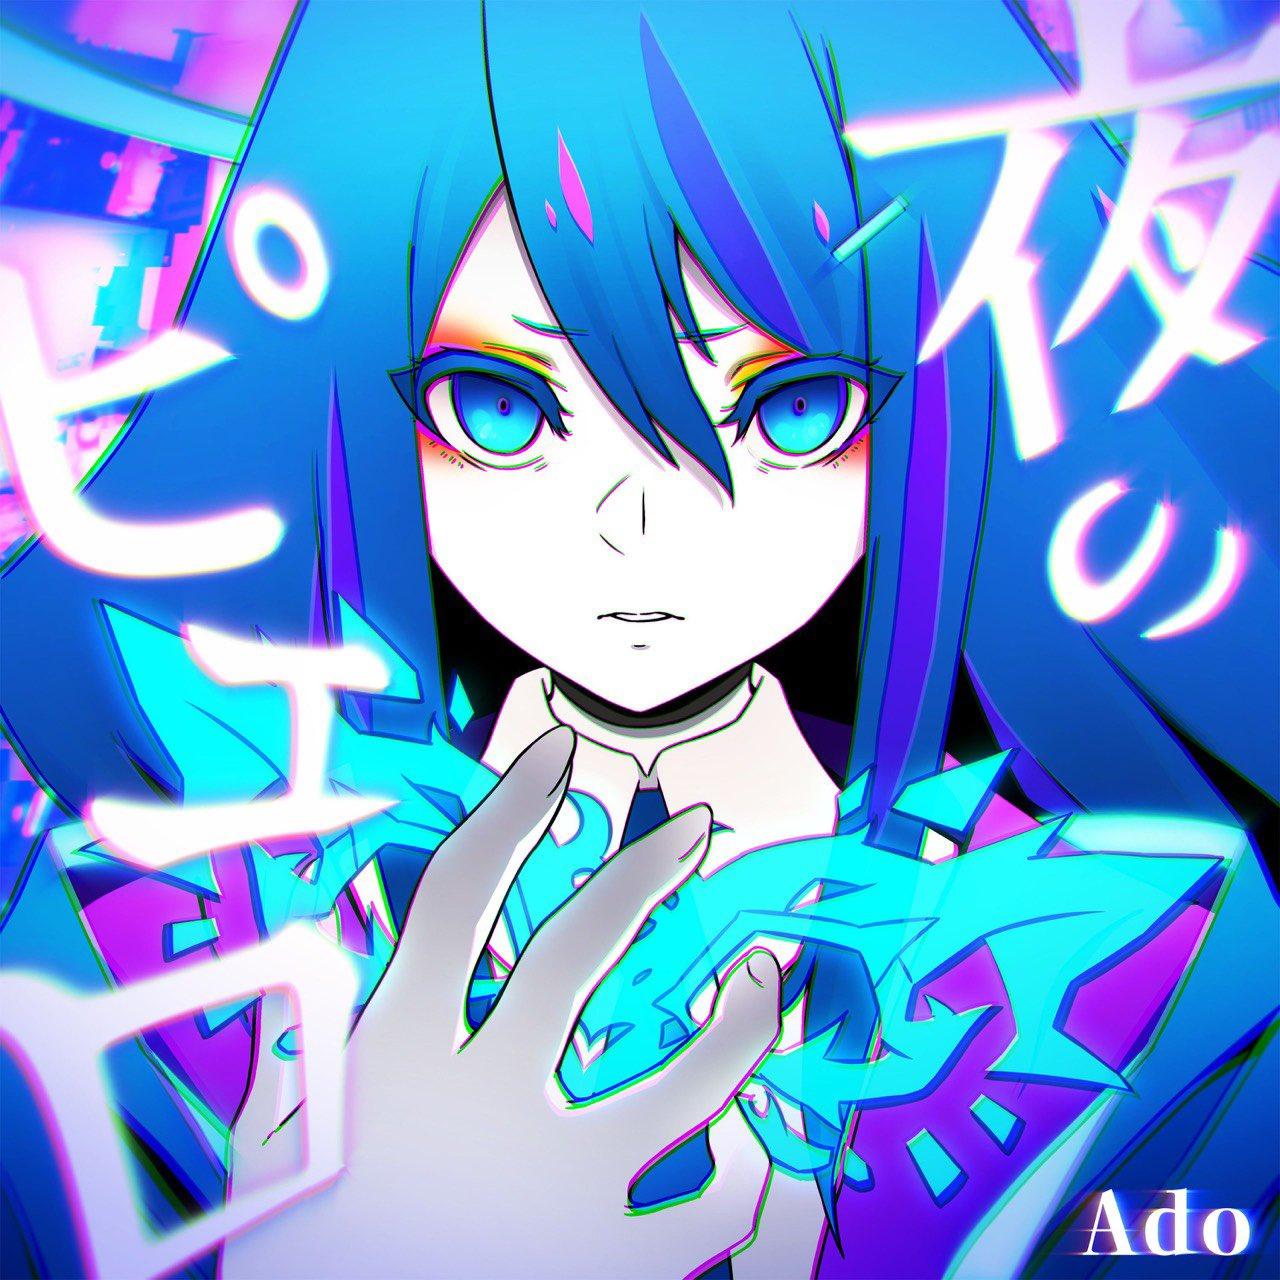 Ado - 夜のピエロ